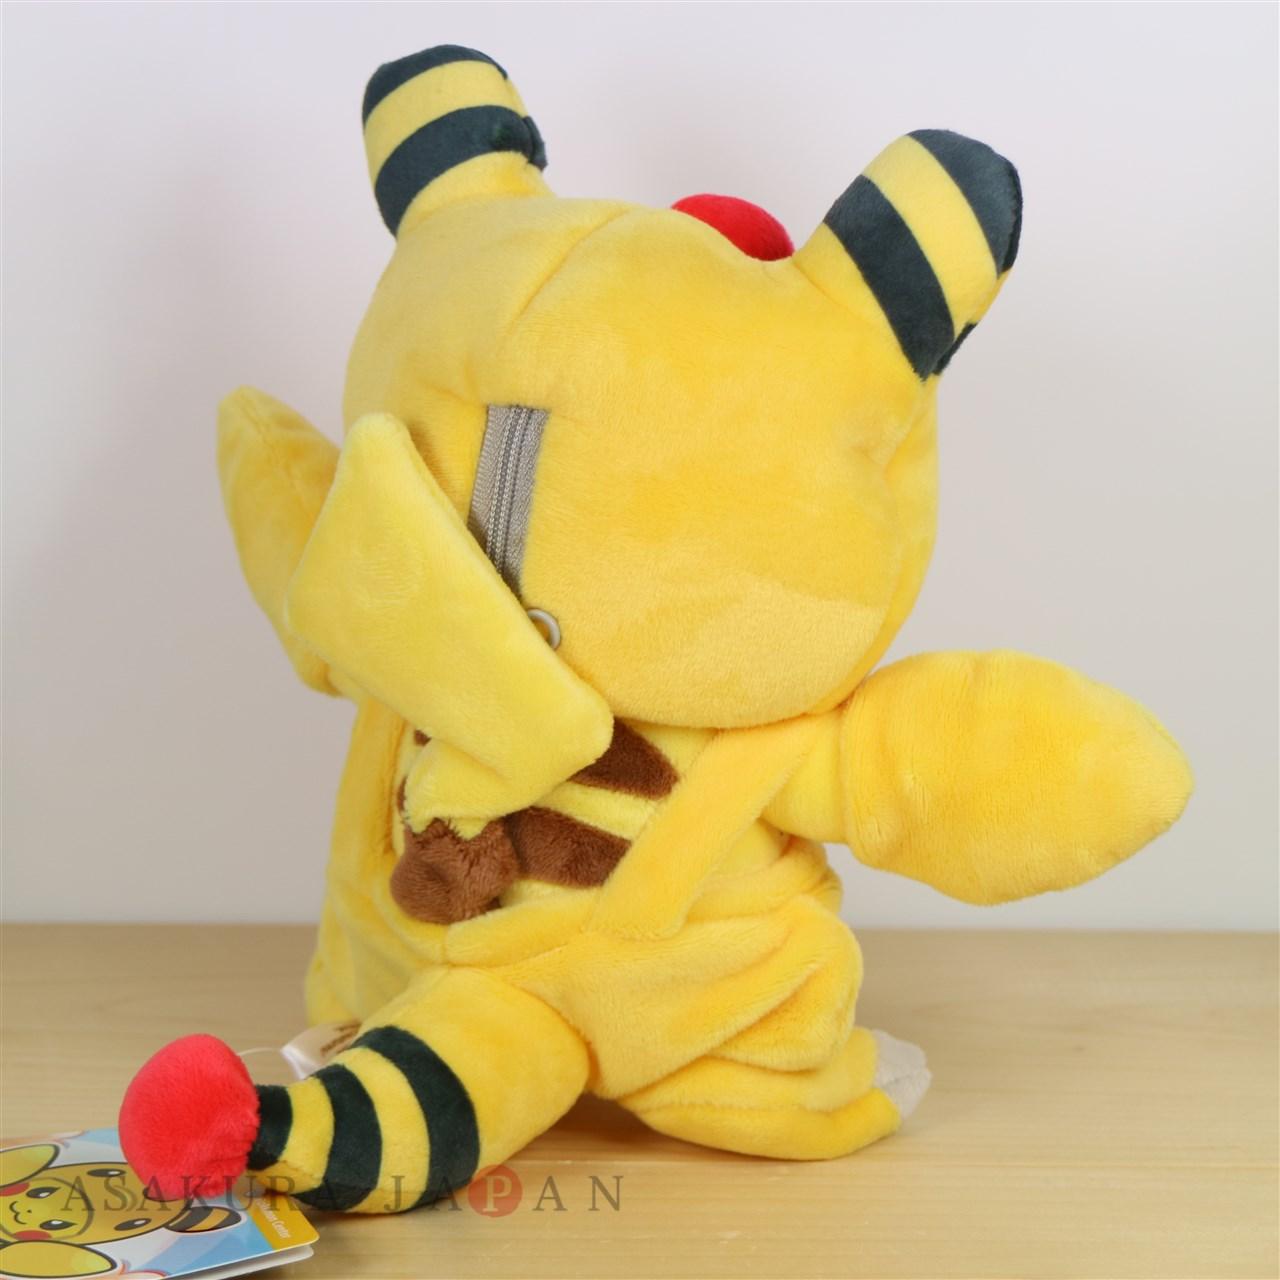 Denryu Pokemon Center Original Plush Doll Ampharos Mania Pikachu 4521329252551